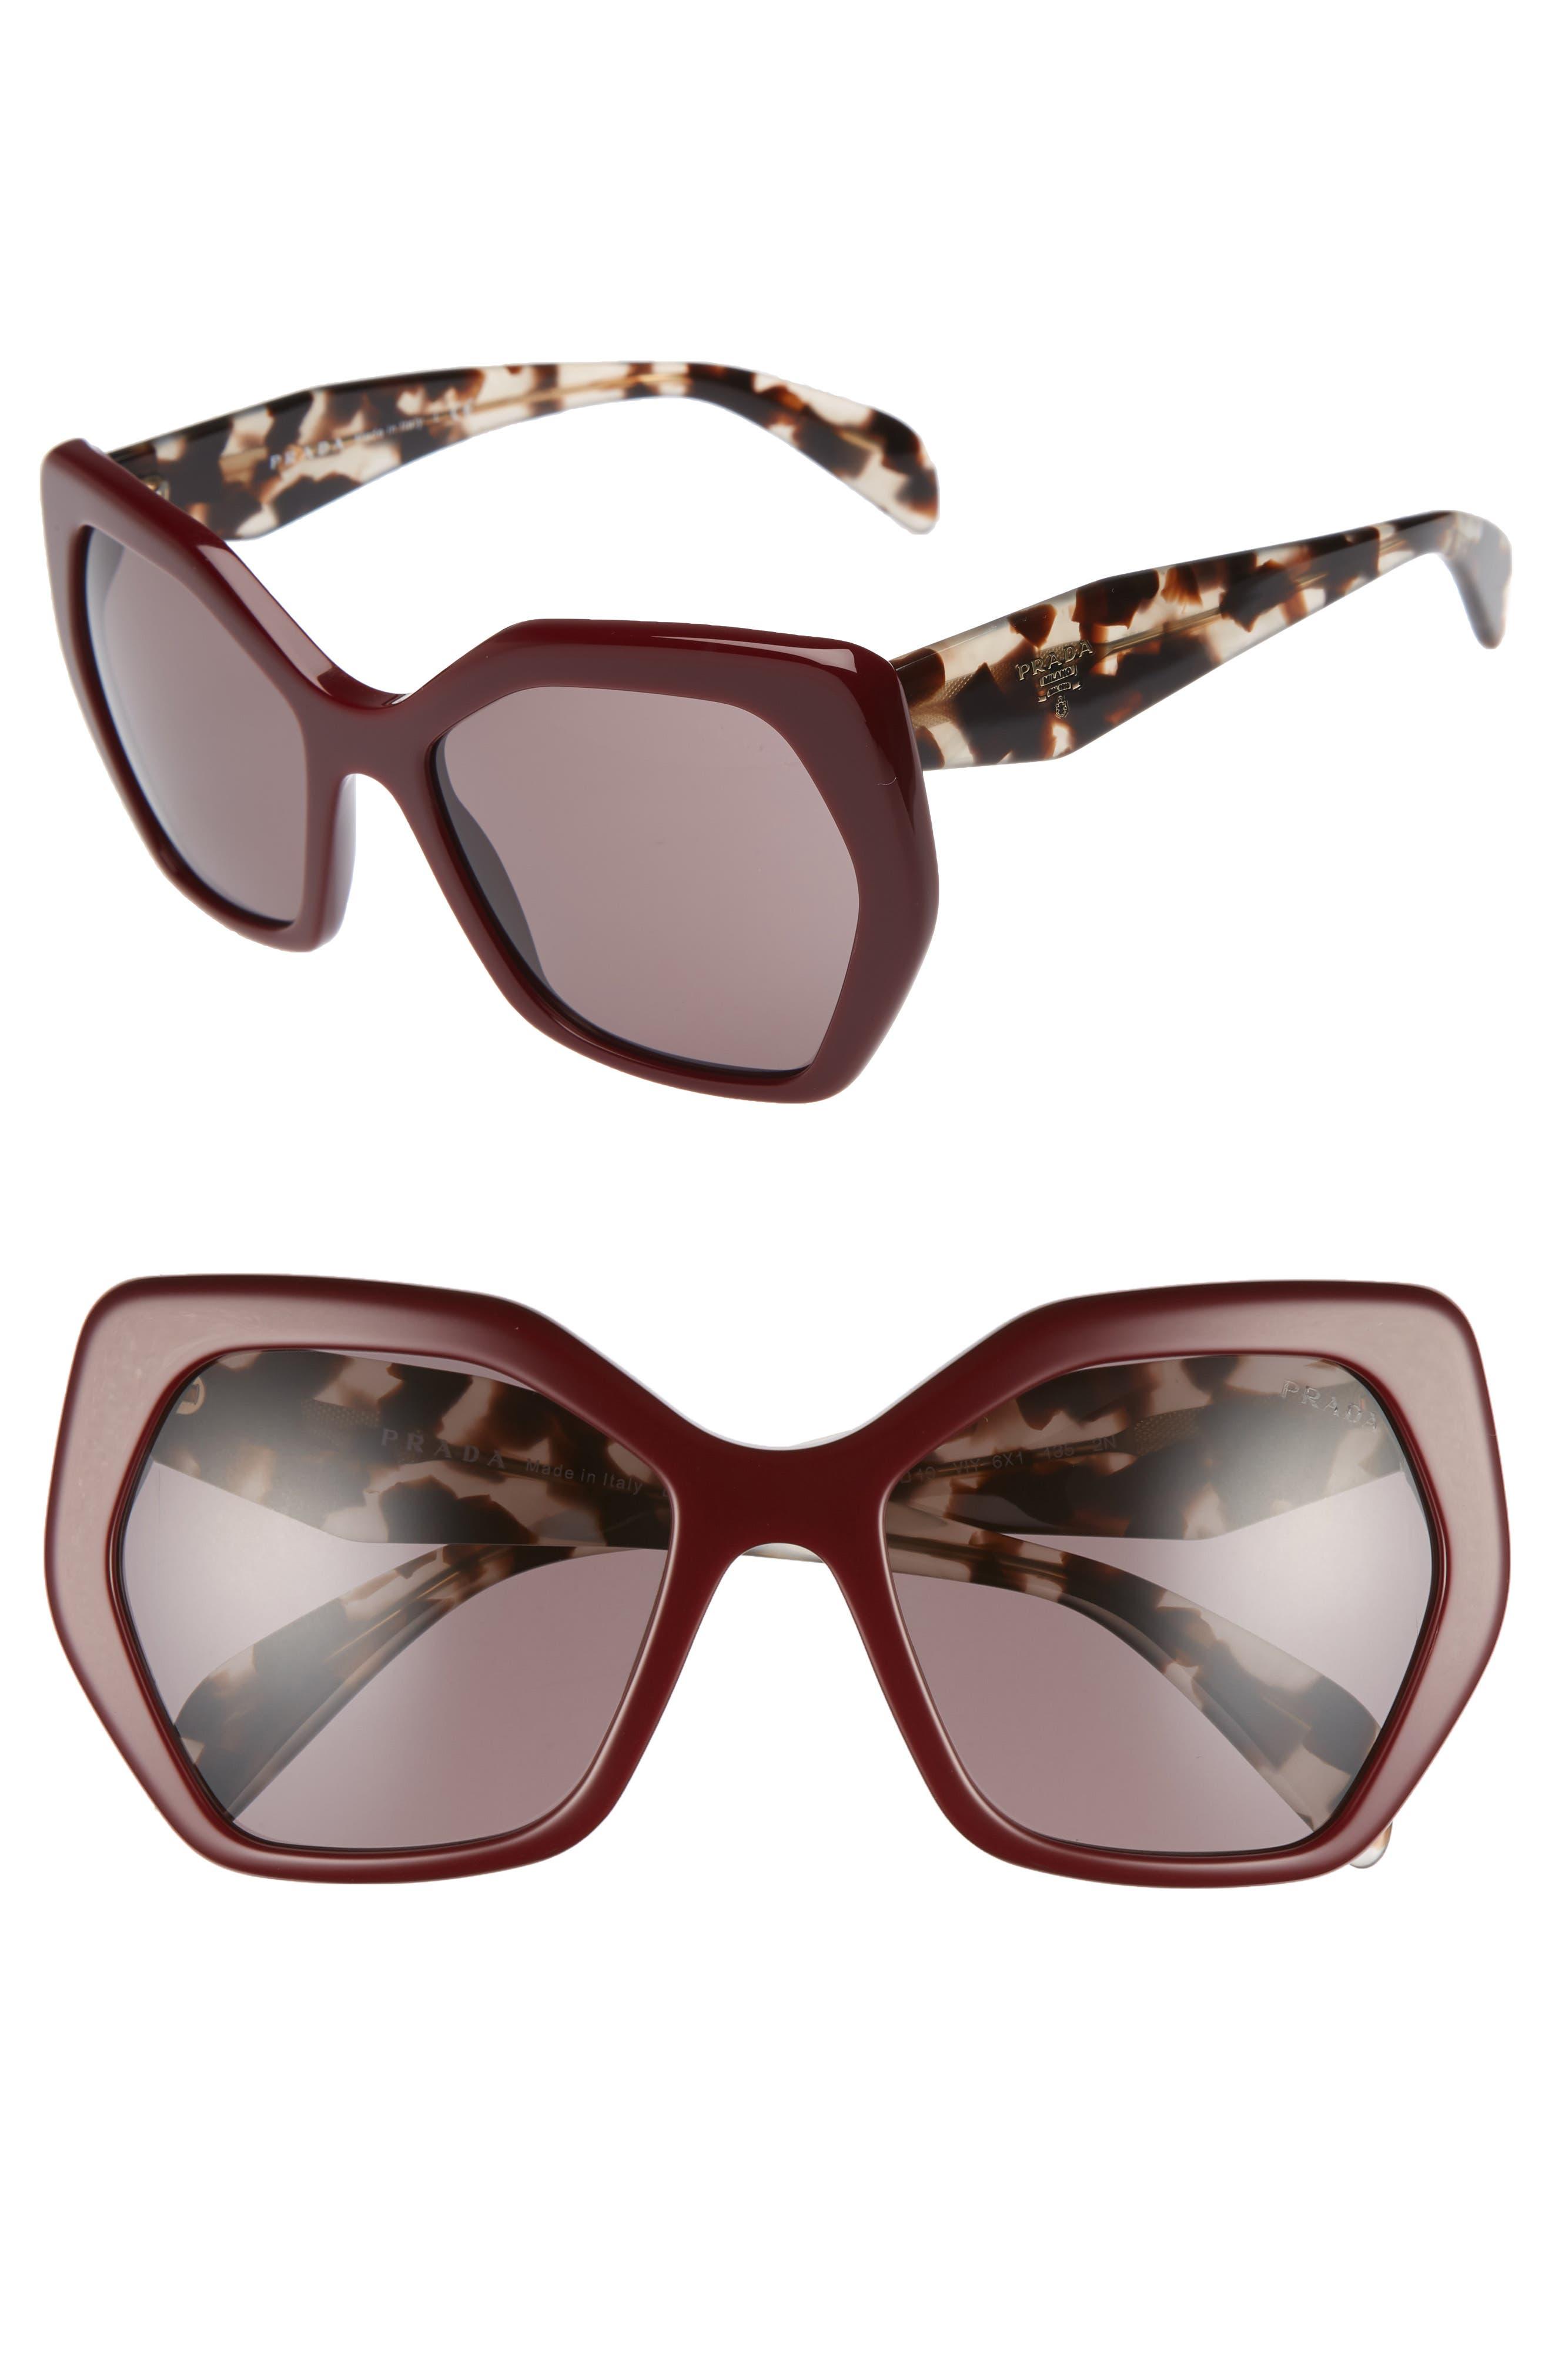 Heritage 56mm Sunglasses,                         Main,                         color, Maroon